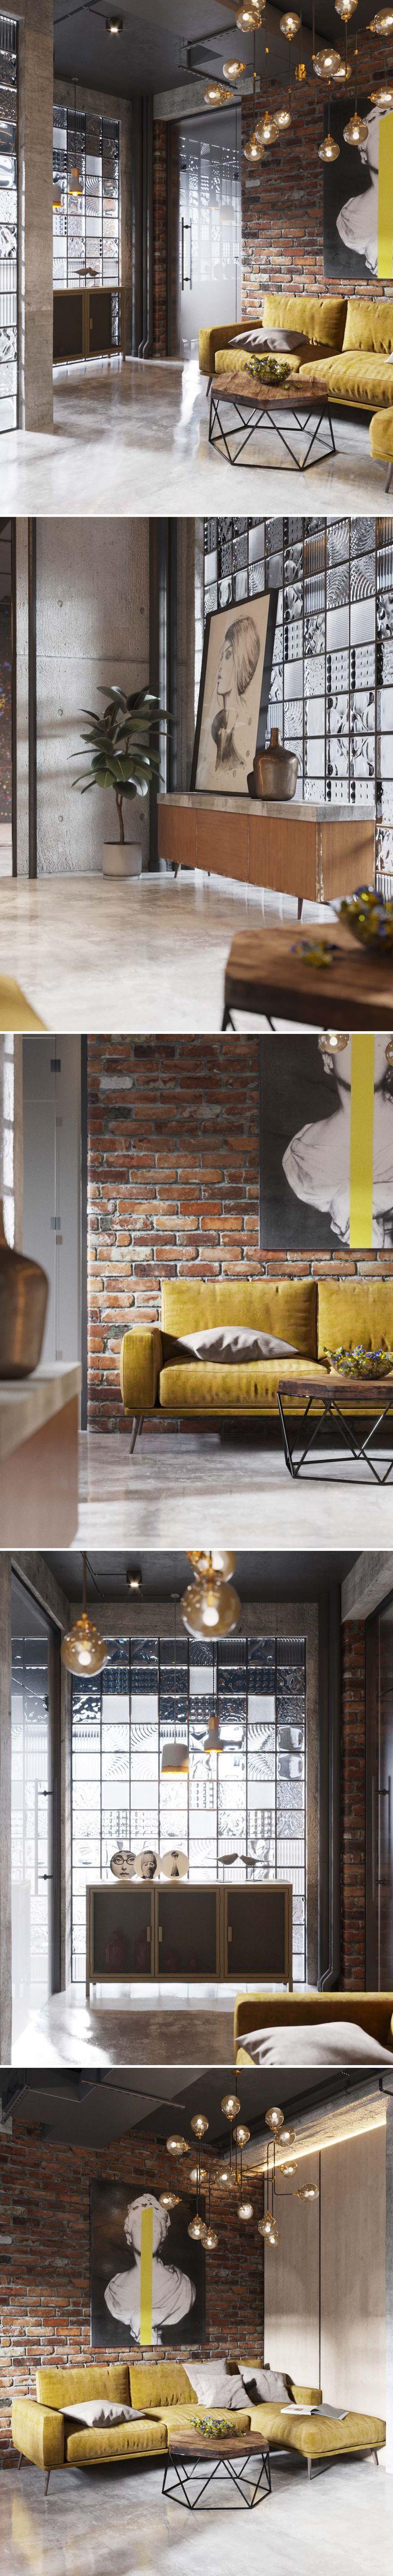 New project for office spaces loft style - Галерея 3ddd.ru